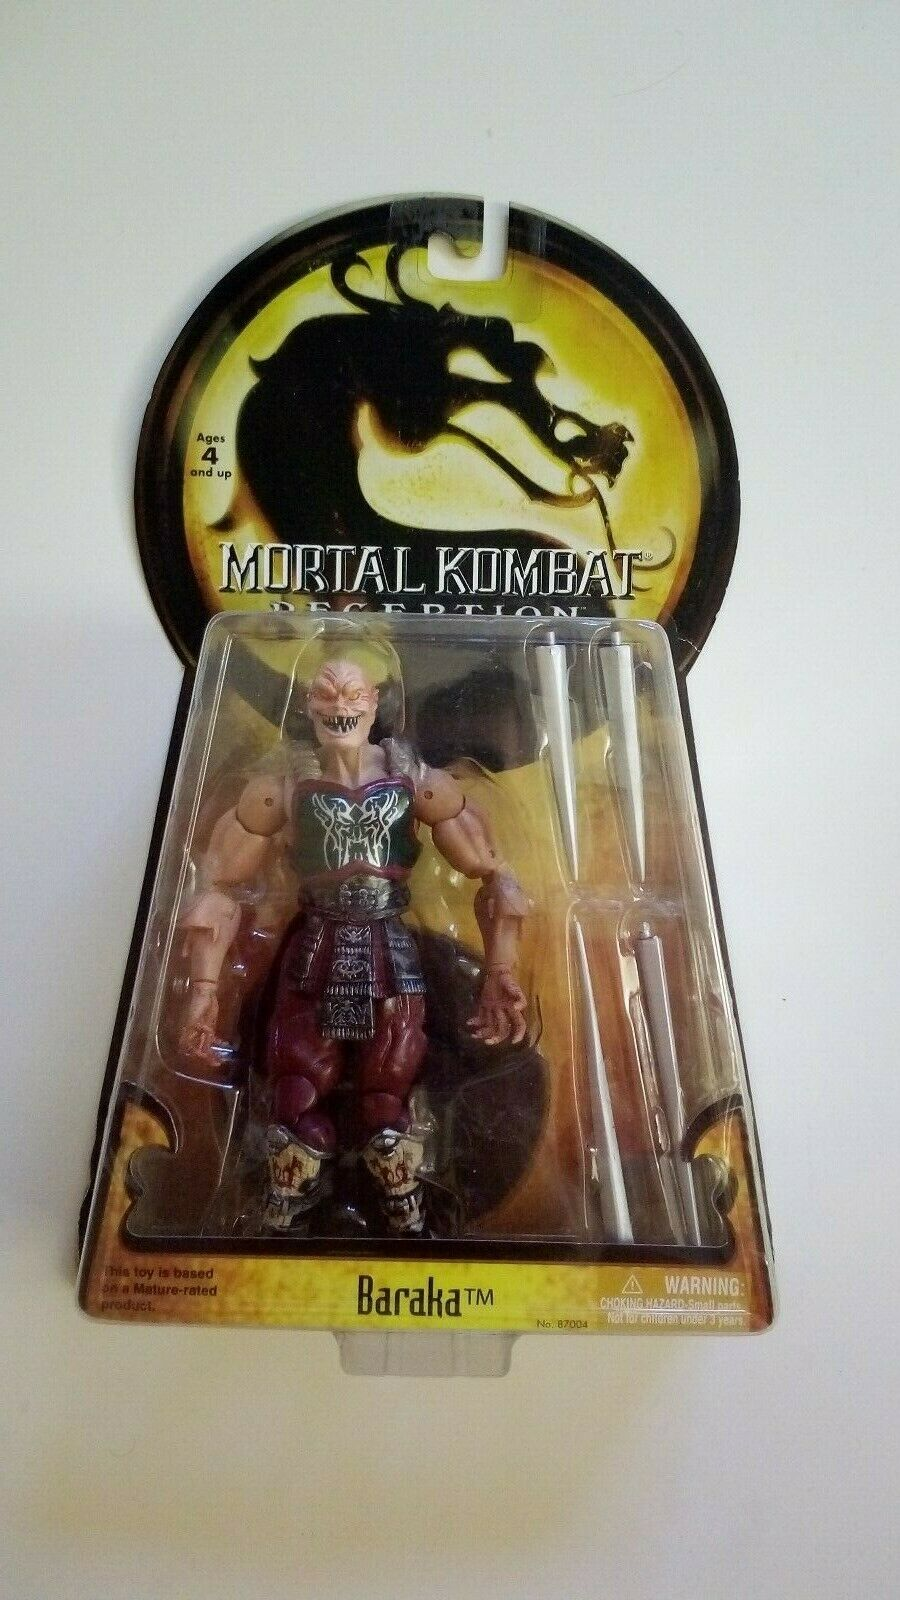 Seltene Mortal Kombat Baraka Figur von Jazwares  Neu & Ovp